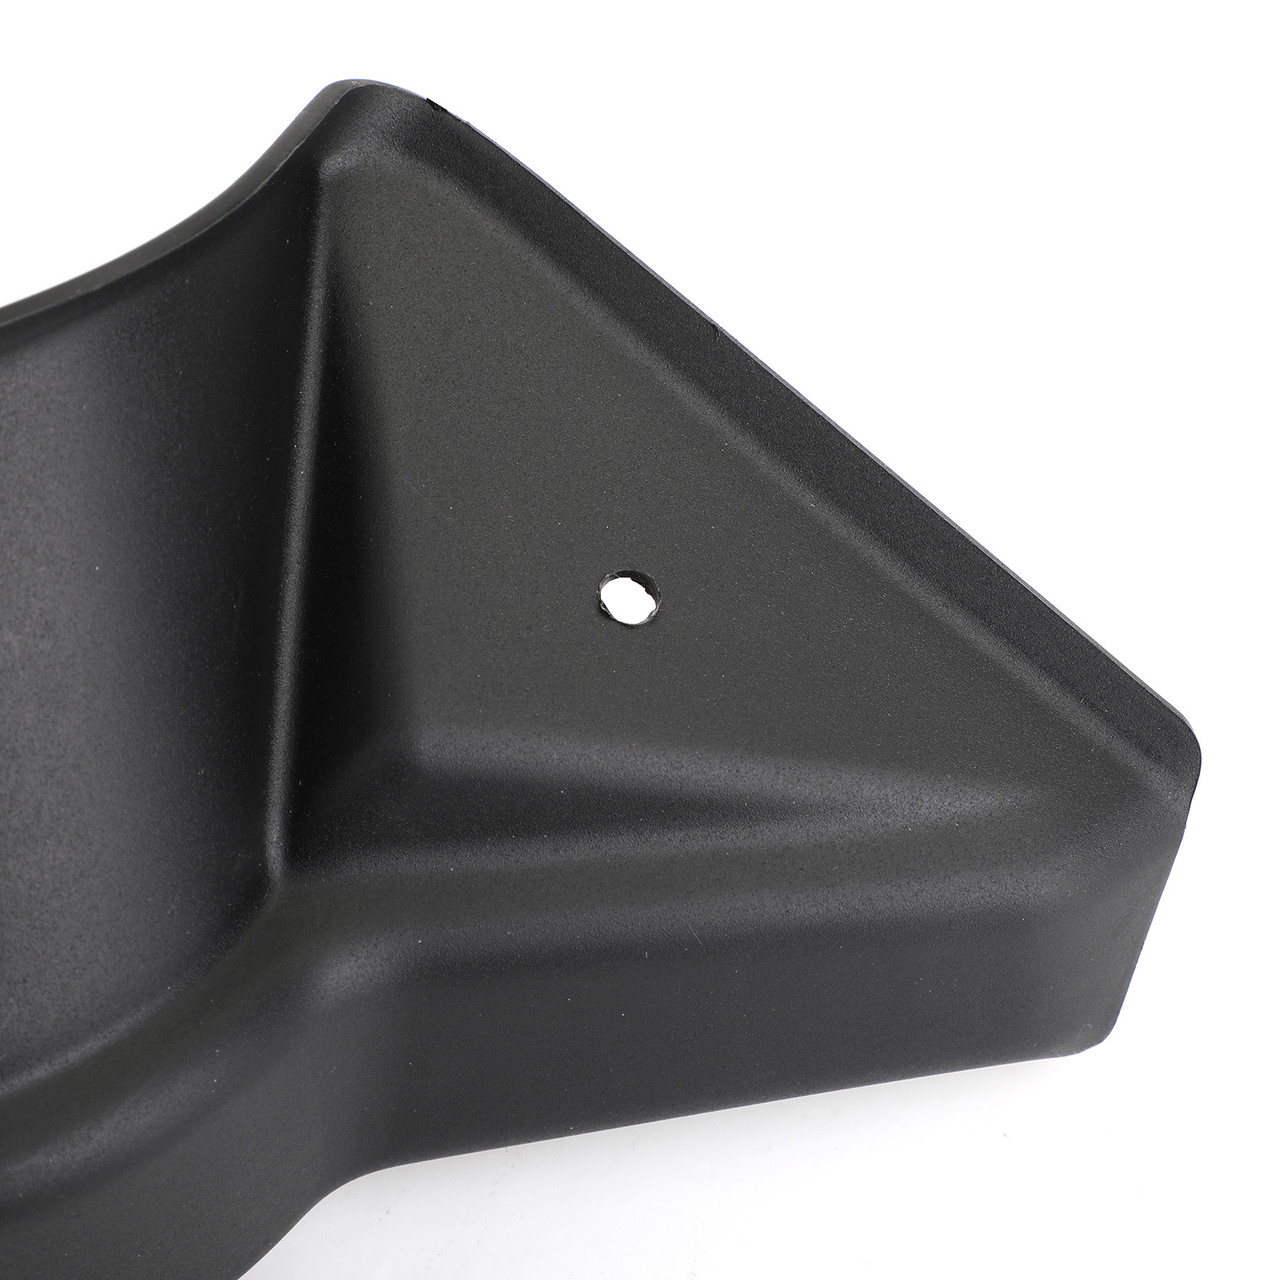 Handguard Handlebar Shells Protector For Suzuki V-Strom DL1000 14-16 DL650 11-17 Black